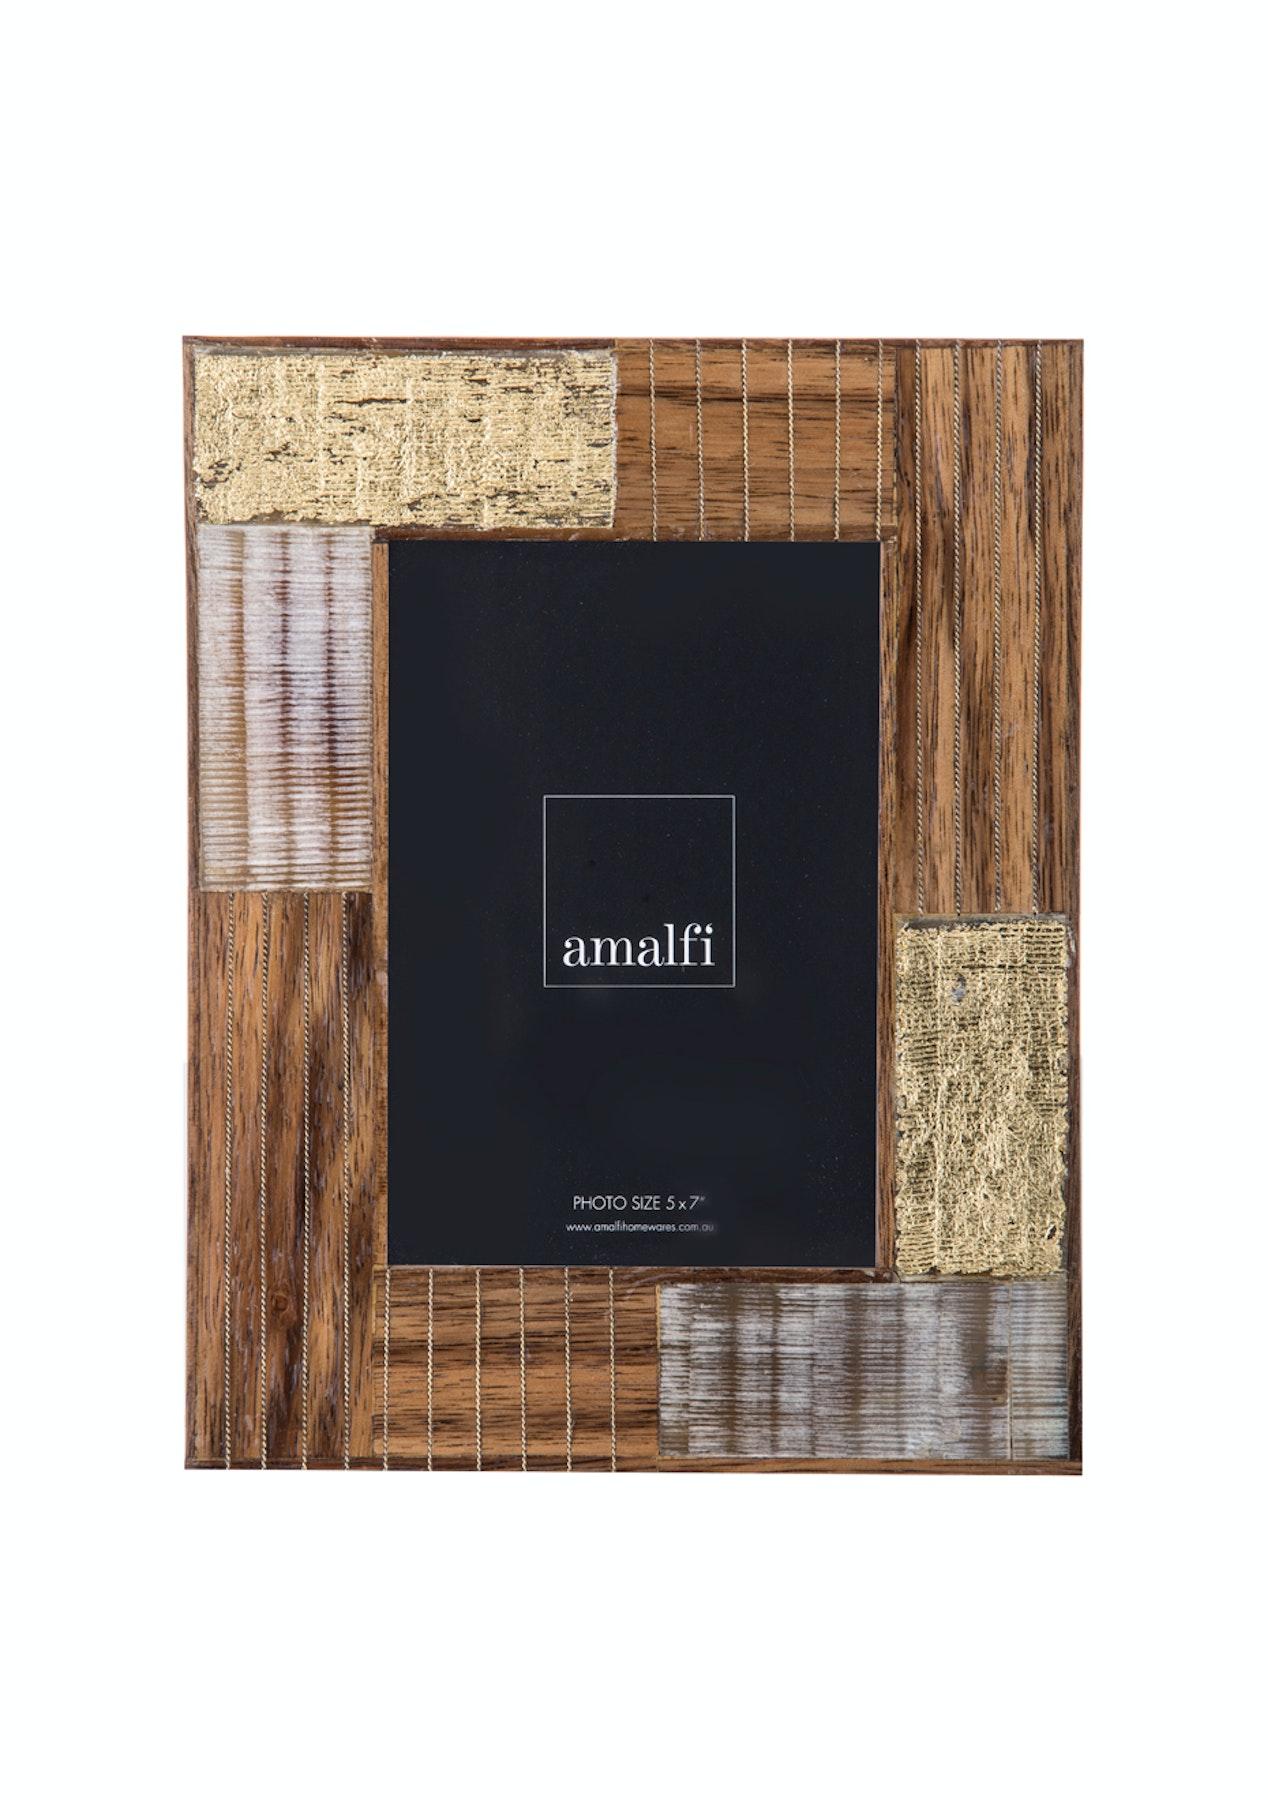 Amalfi - Niana 5x7